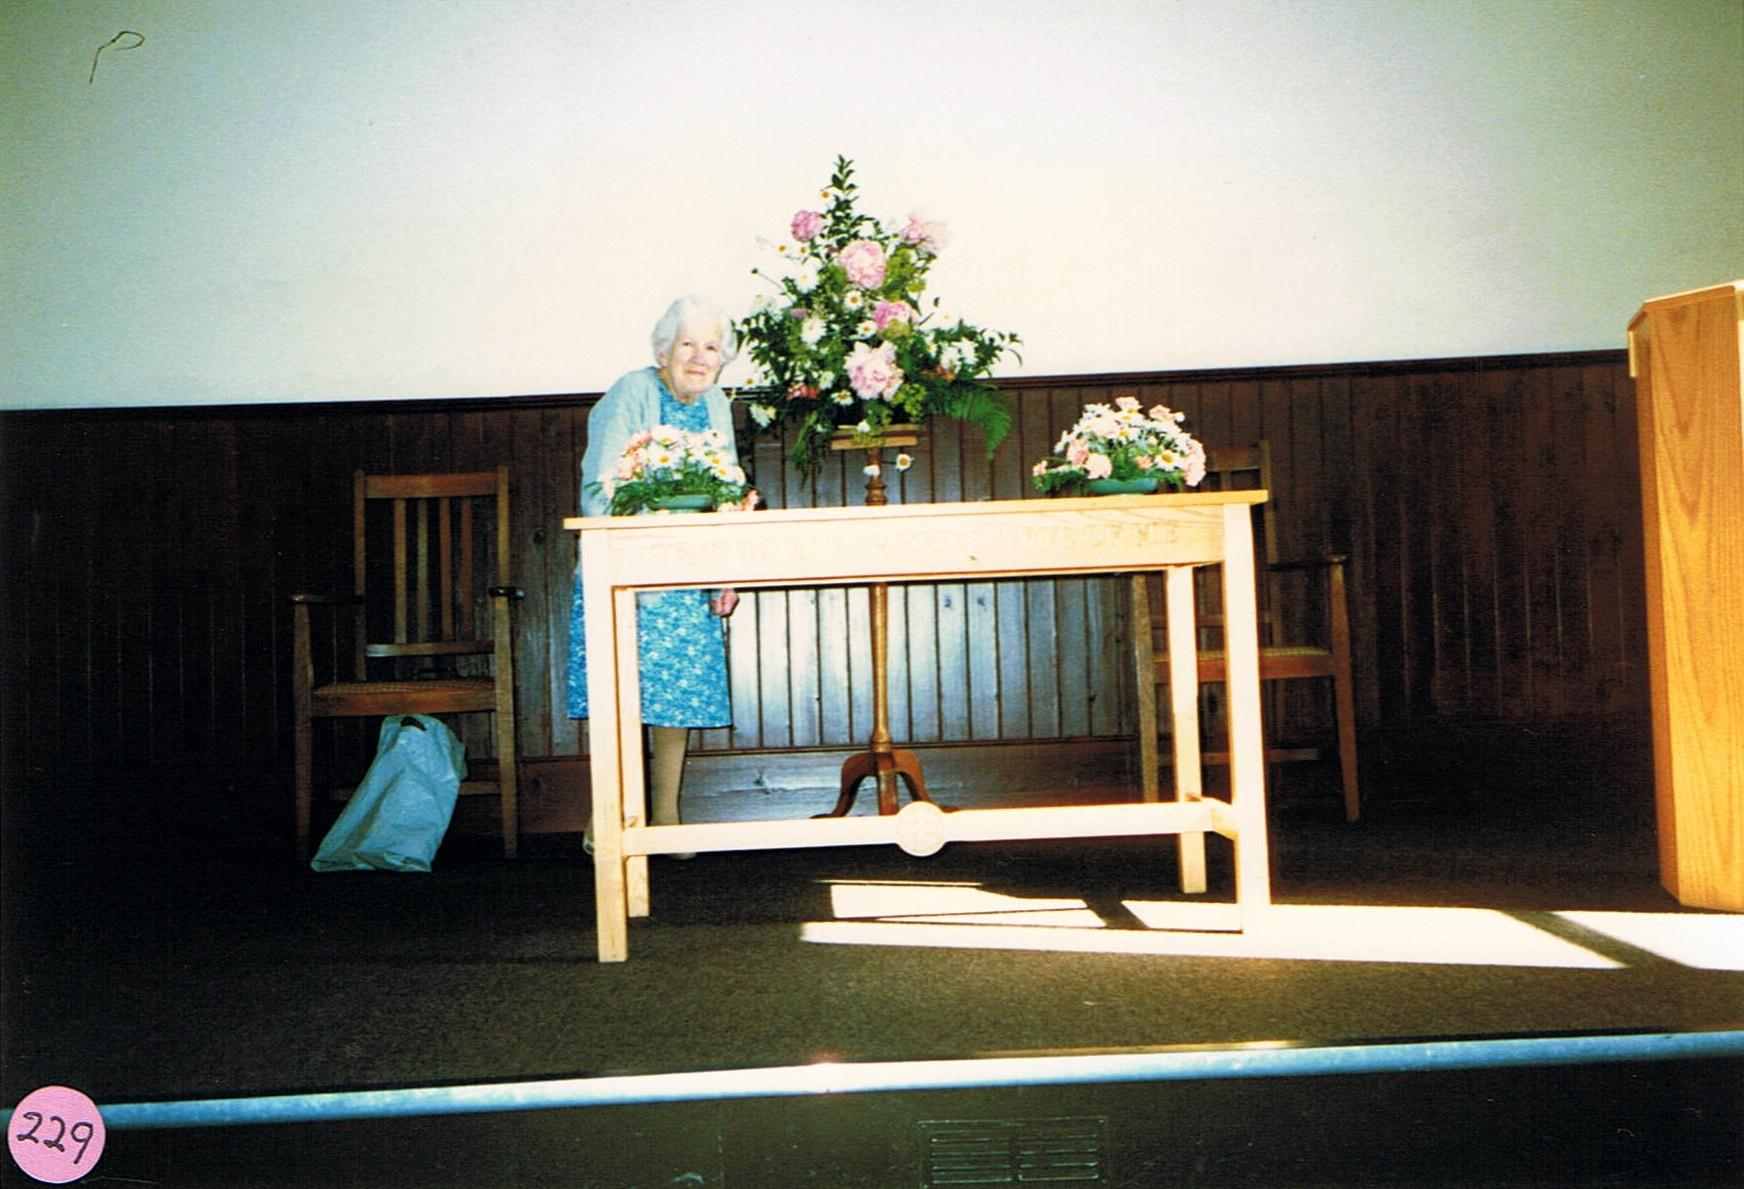 c. 1987. Ruth Kirby, Methodist Chapel.